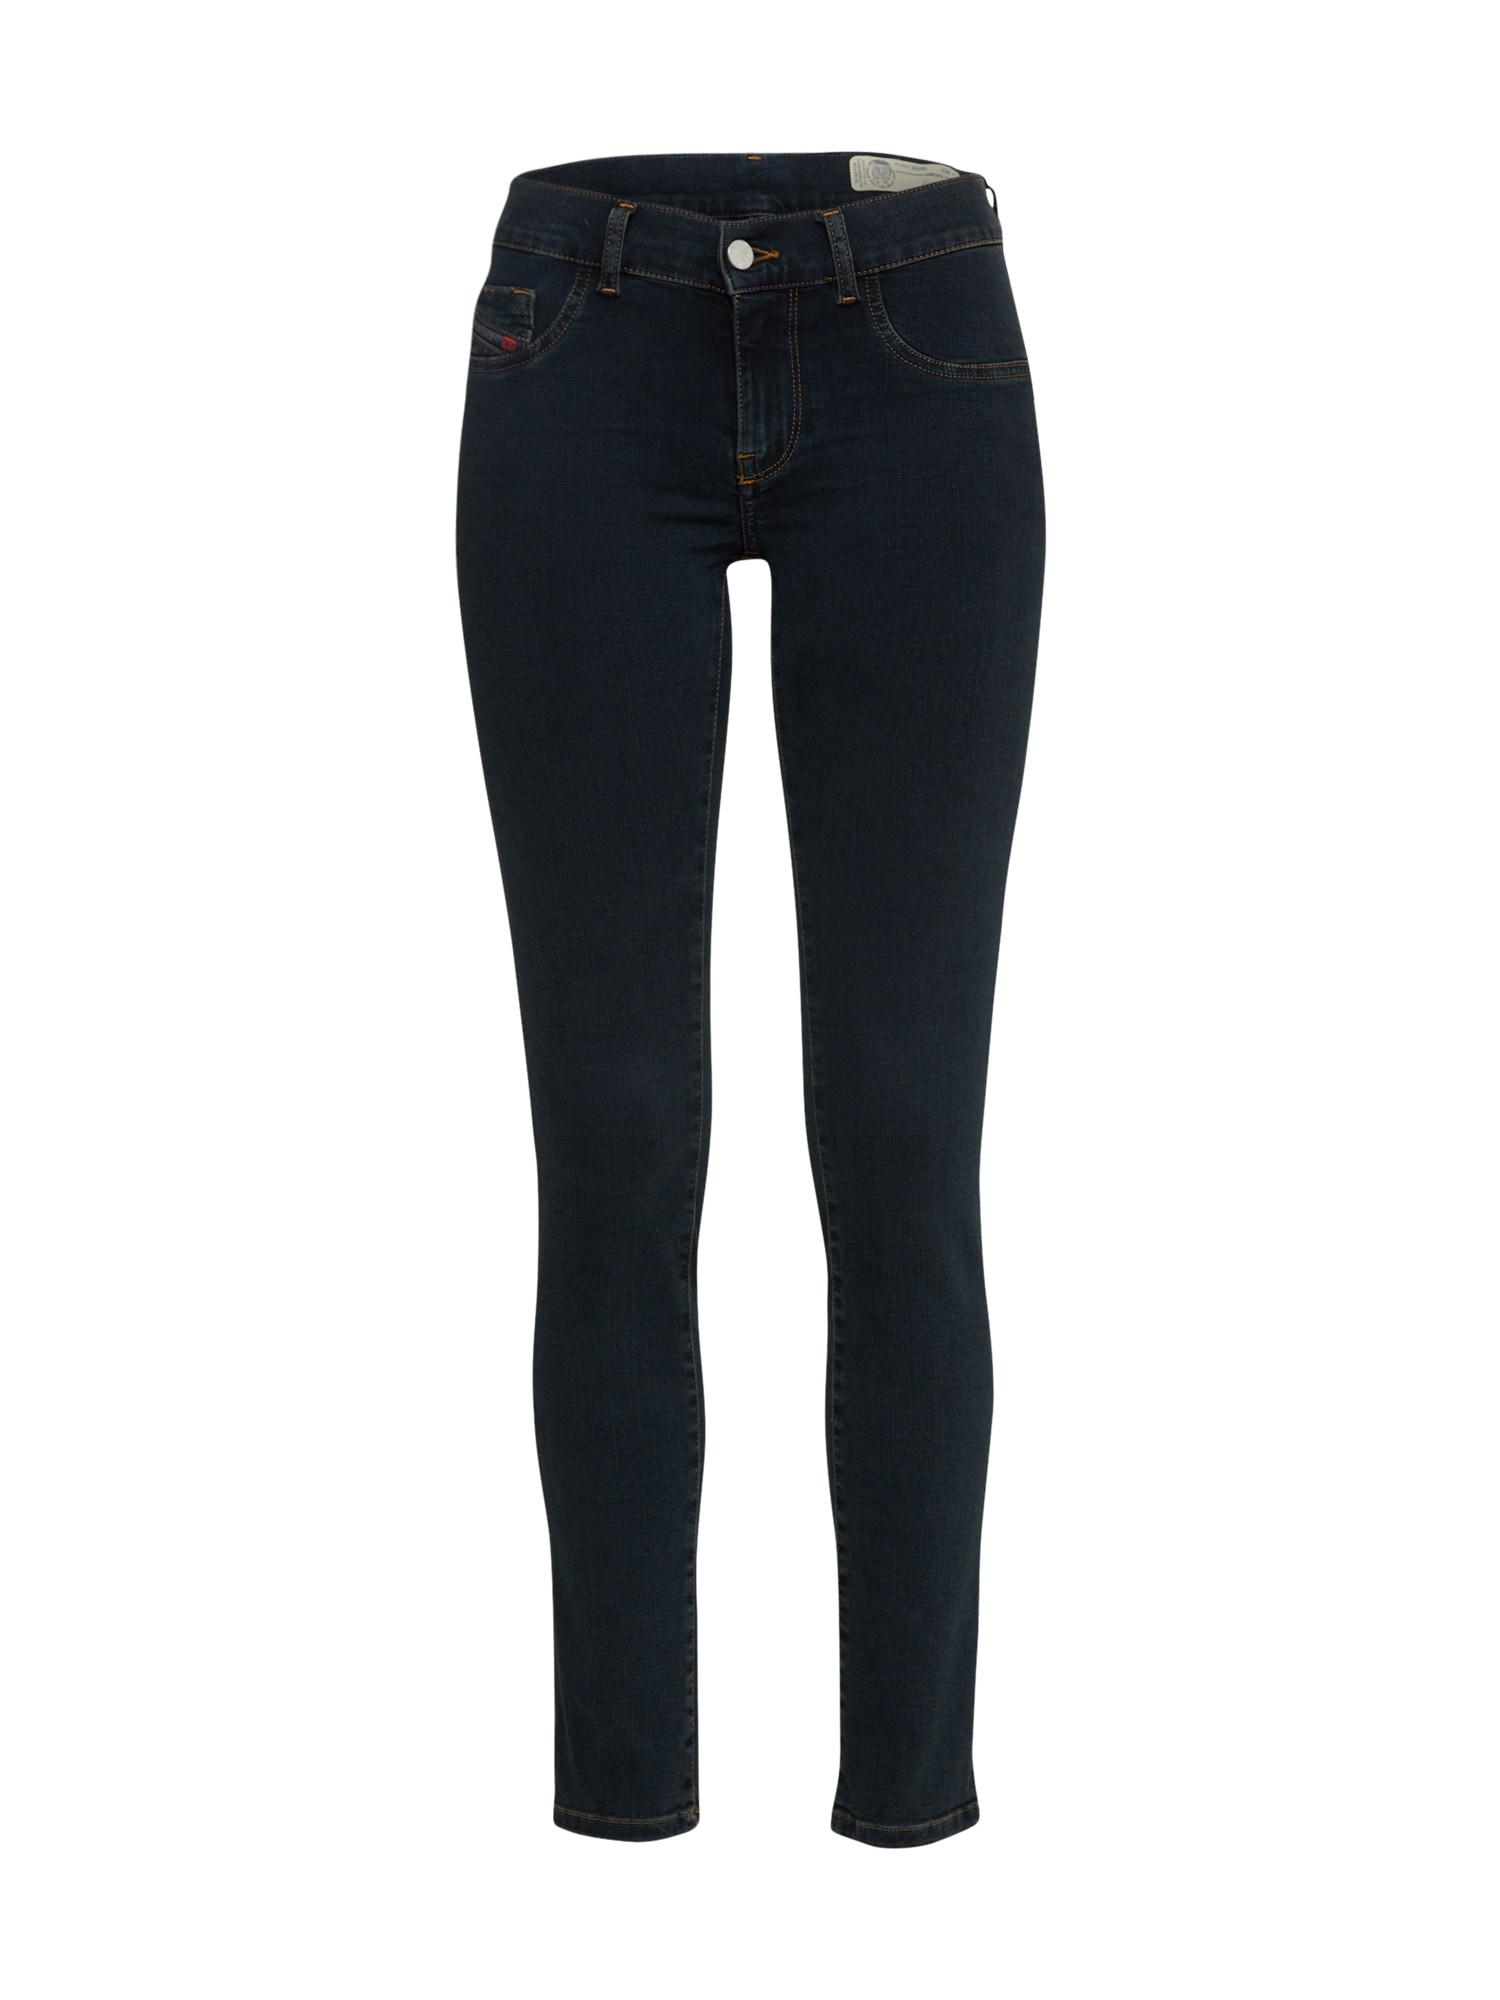 DIESEL Dames Jeans LIVIER-S 0687L donkerblauw